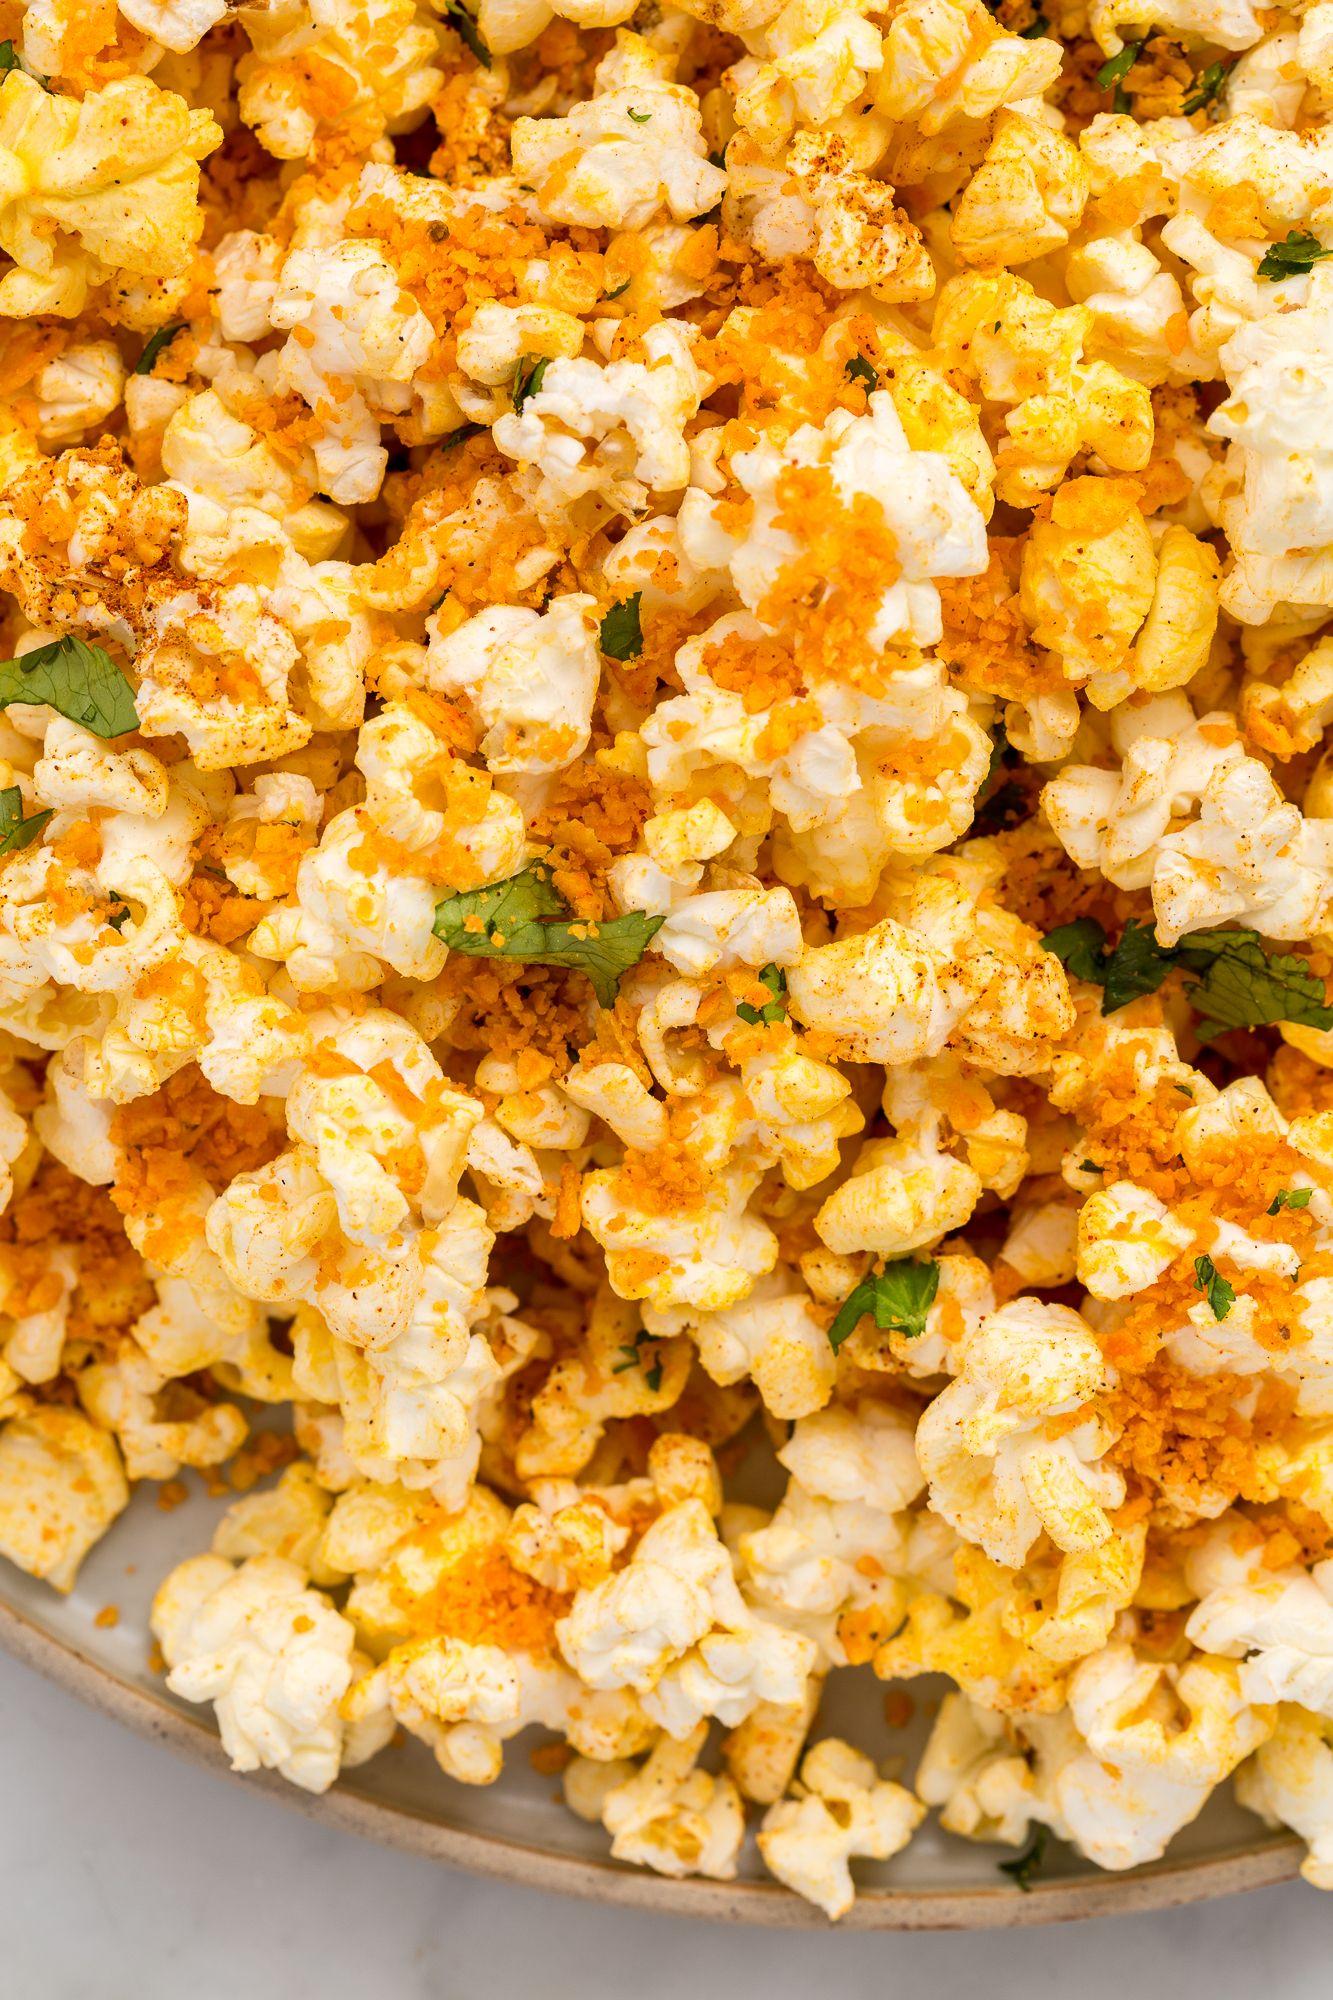 7 Popcorn Hacks That Will Seriously Upgrade Movie Night pics